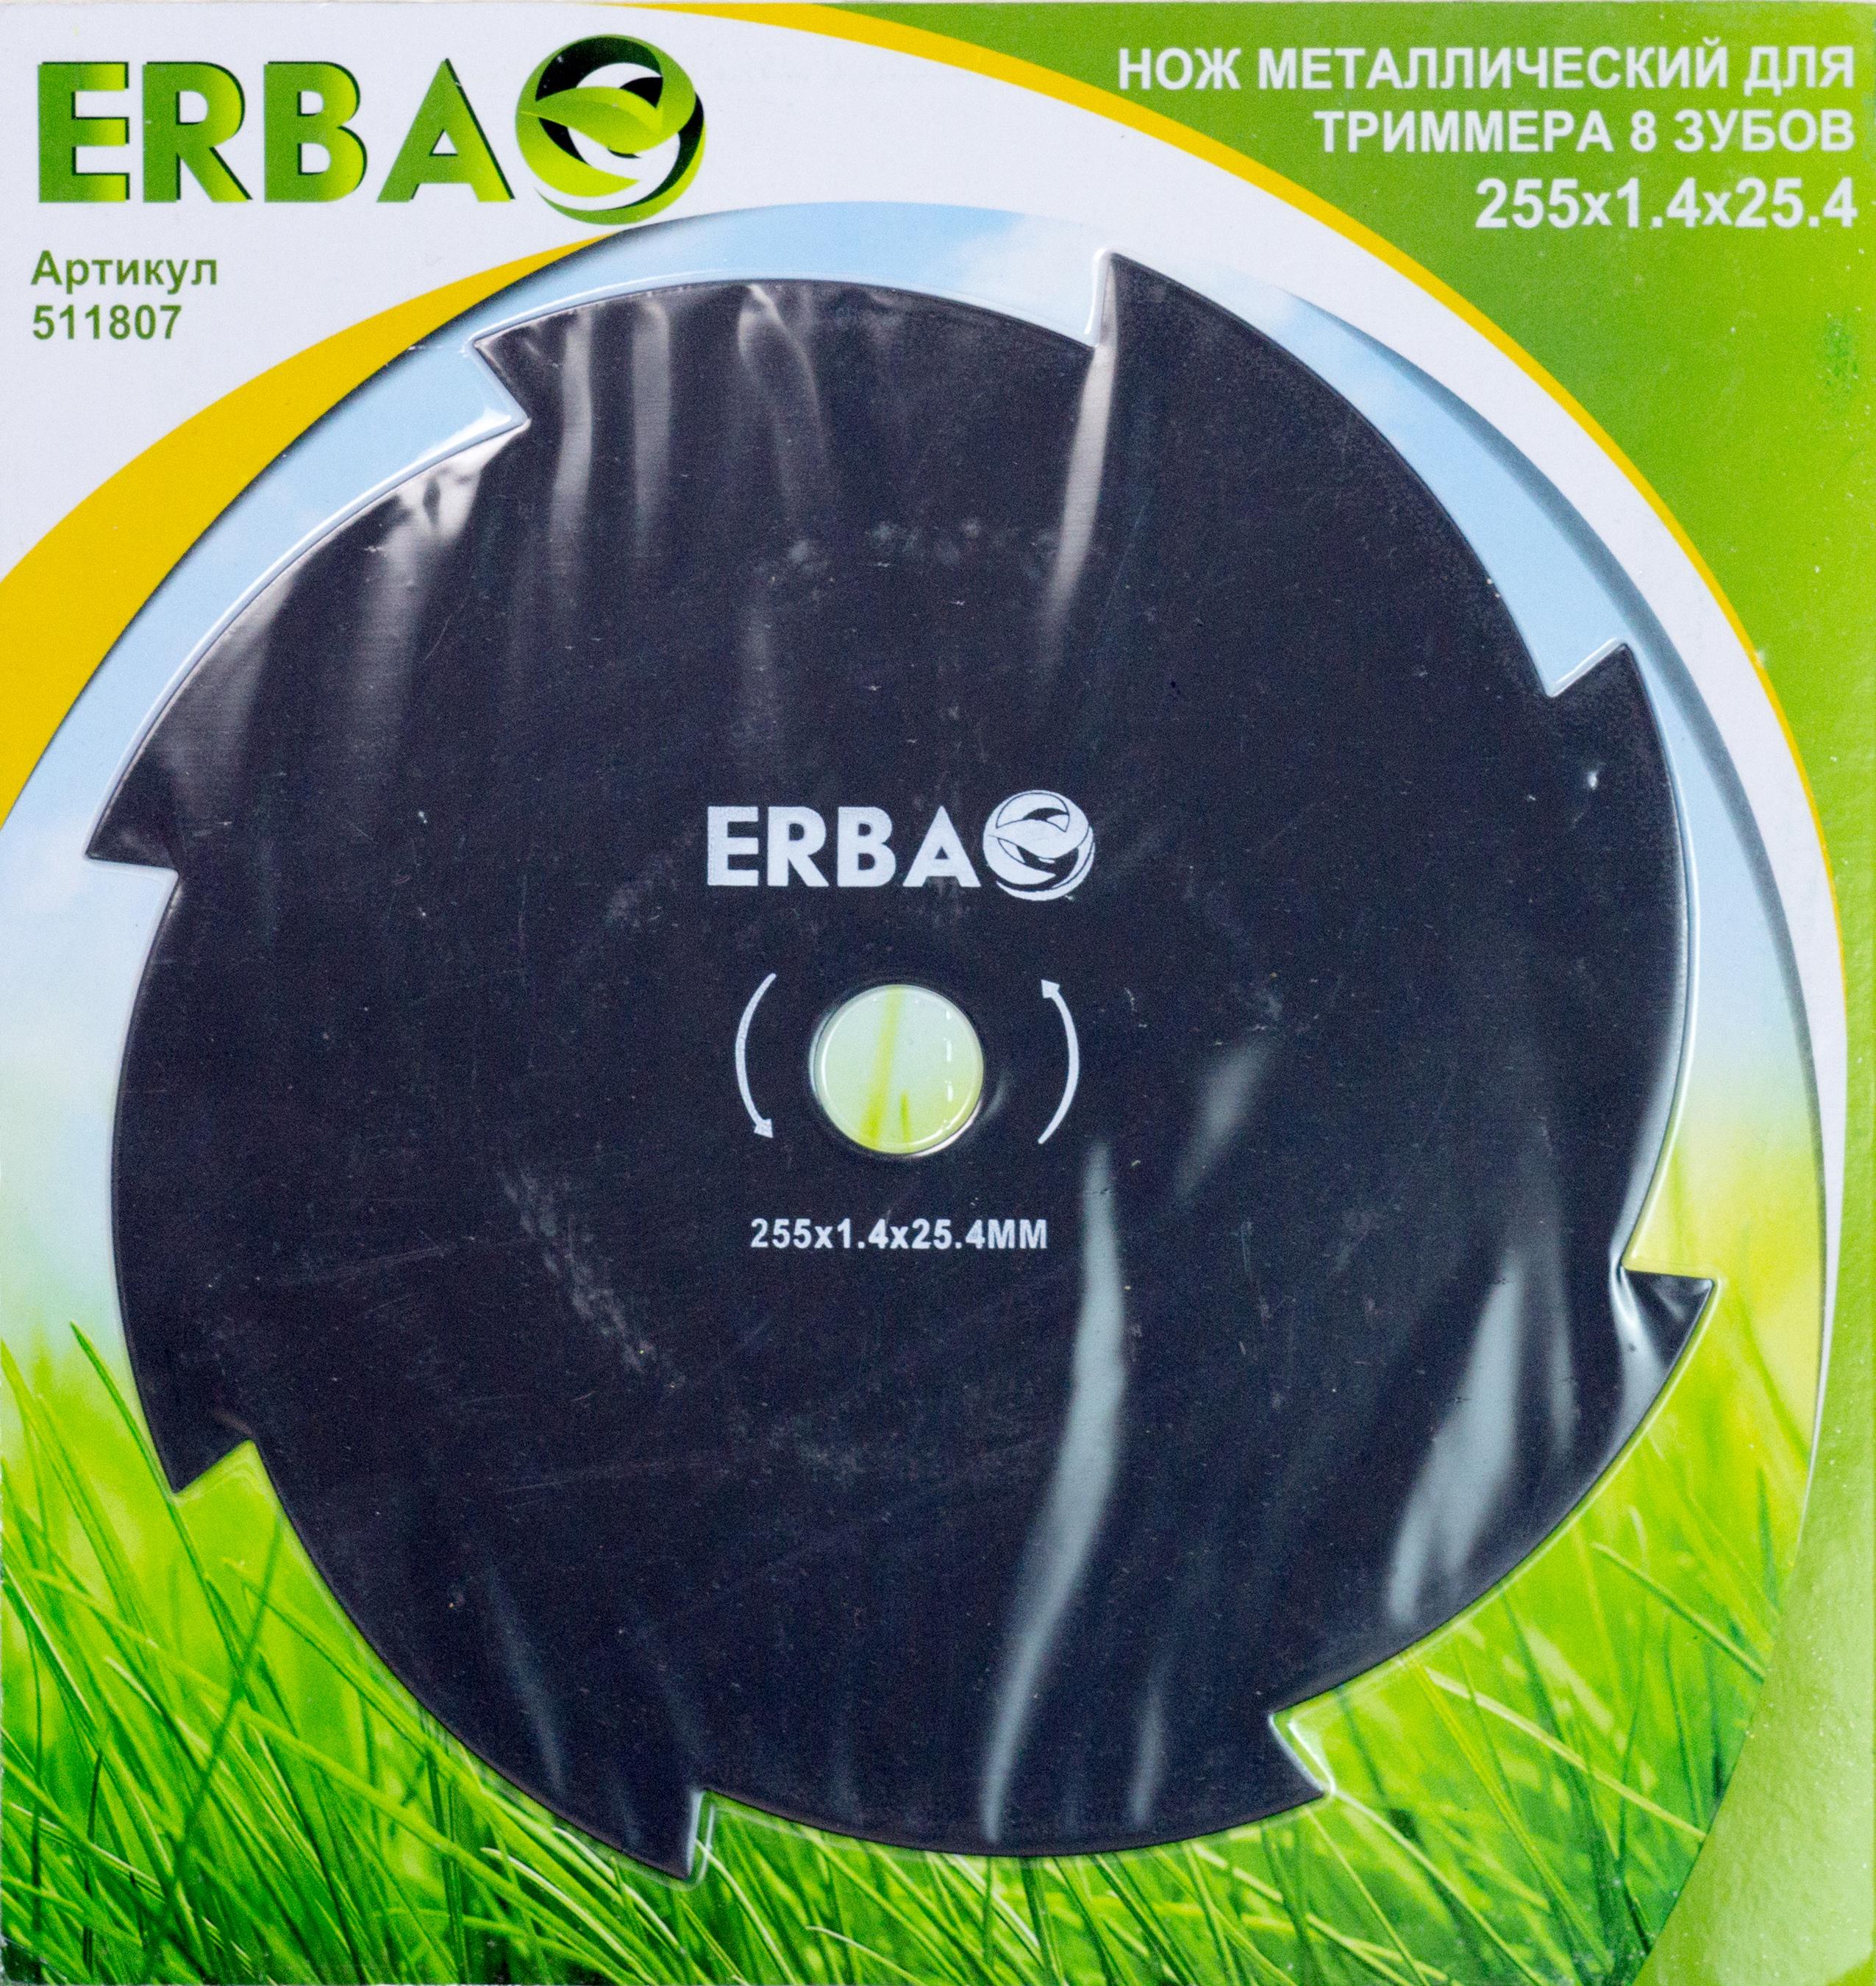 Нож для триммера Erba, 8 зубов, 25 х 2,54 см нож champion для жесткой травы c5120 c774